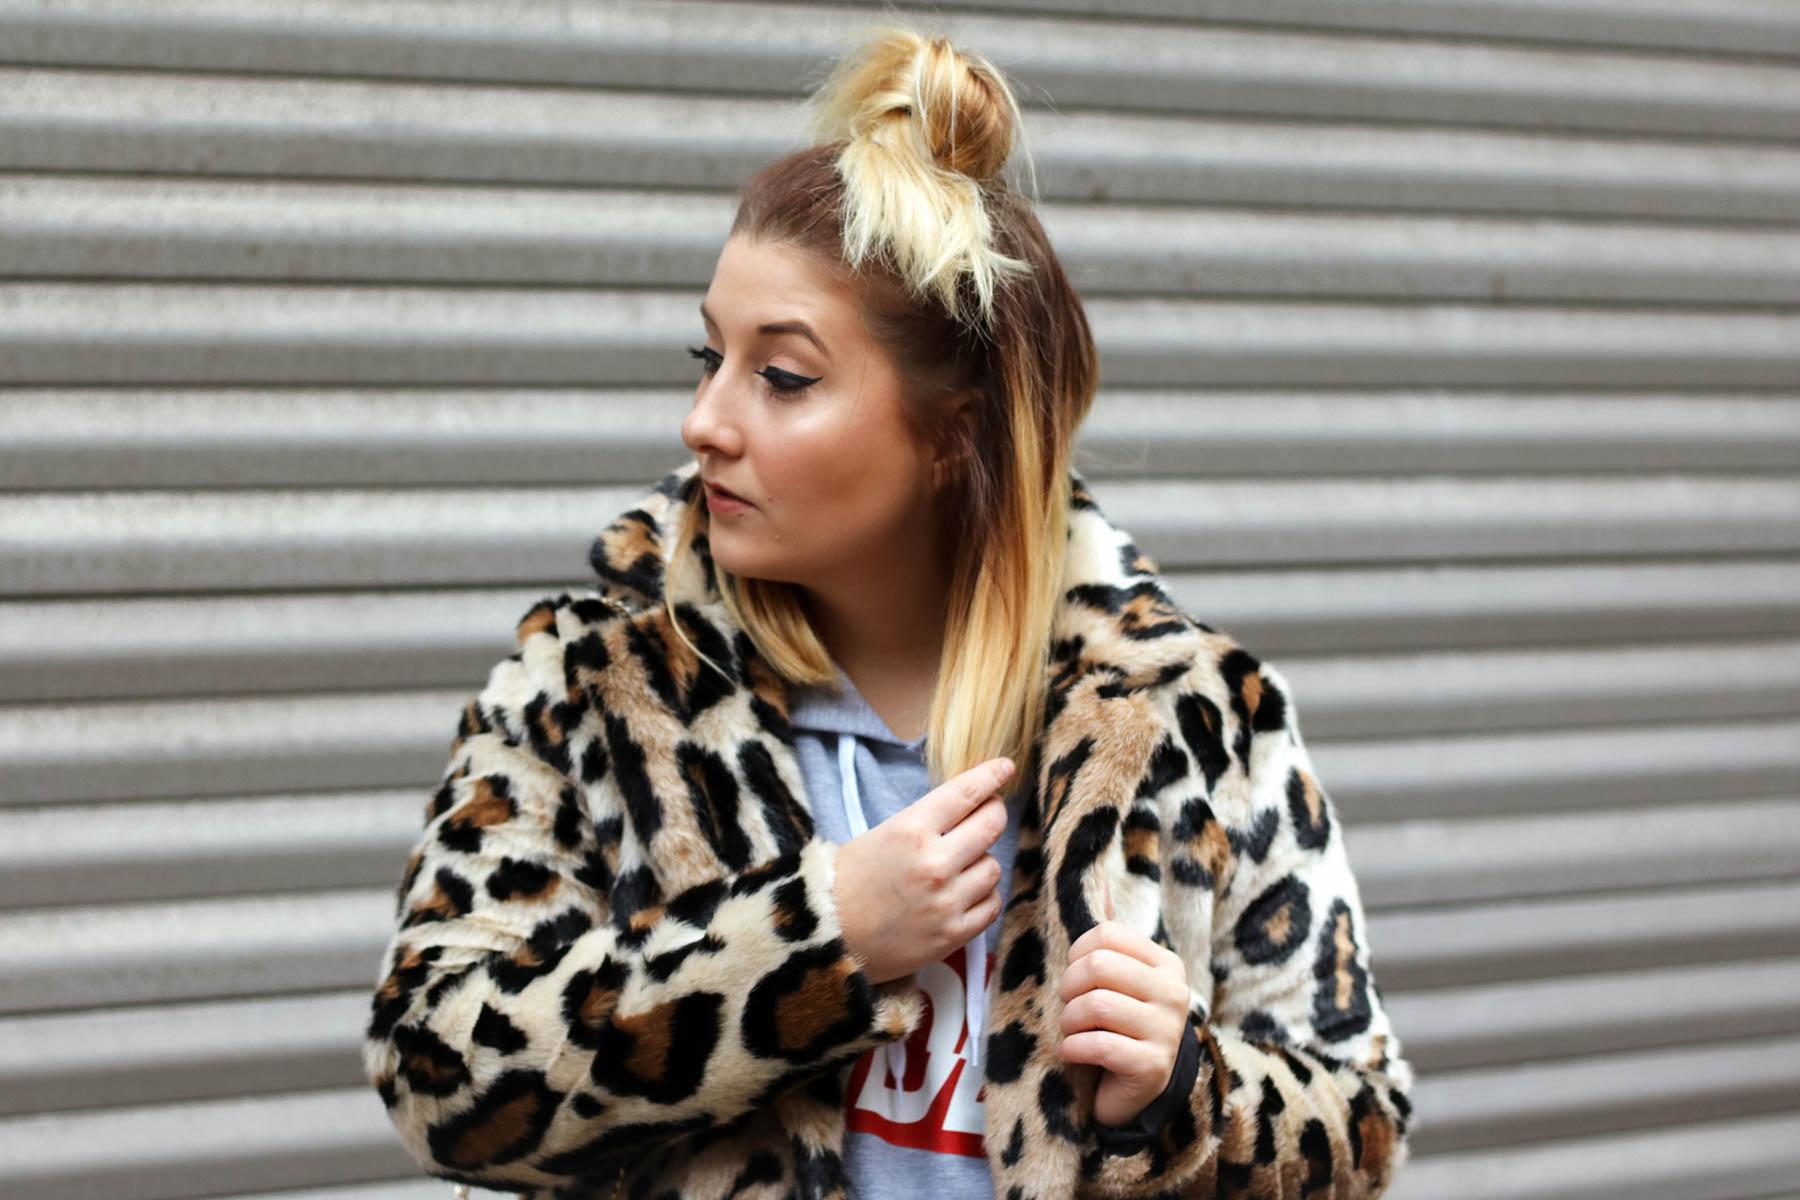 outfit-modeblog-fashionblog-fashionpassionlove-leo-mantel-trend-mantel-winter-sneaker-adidas5 (1 von 1)